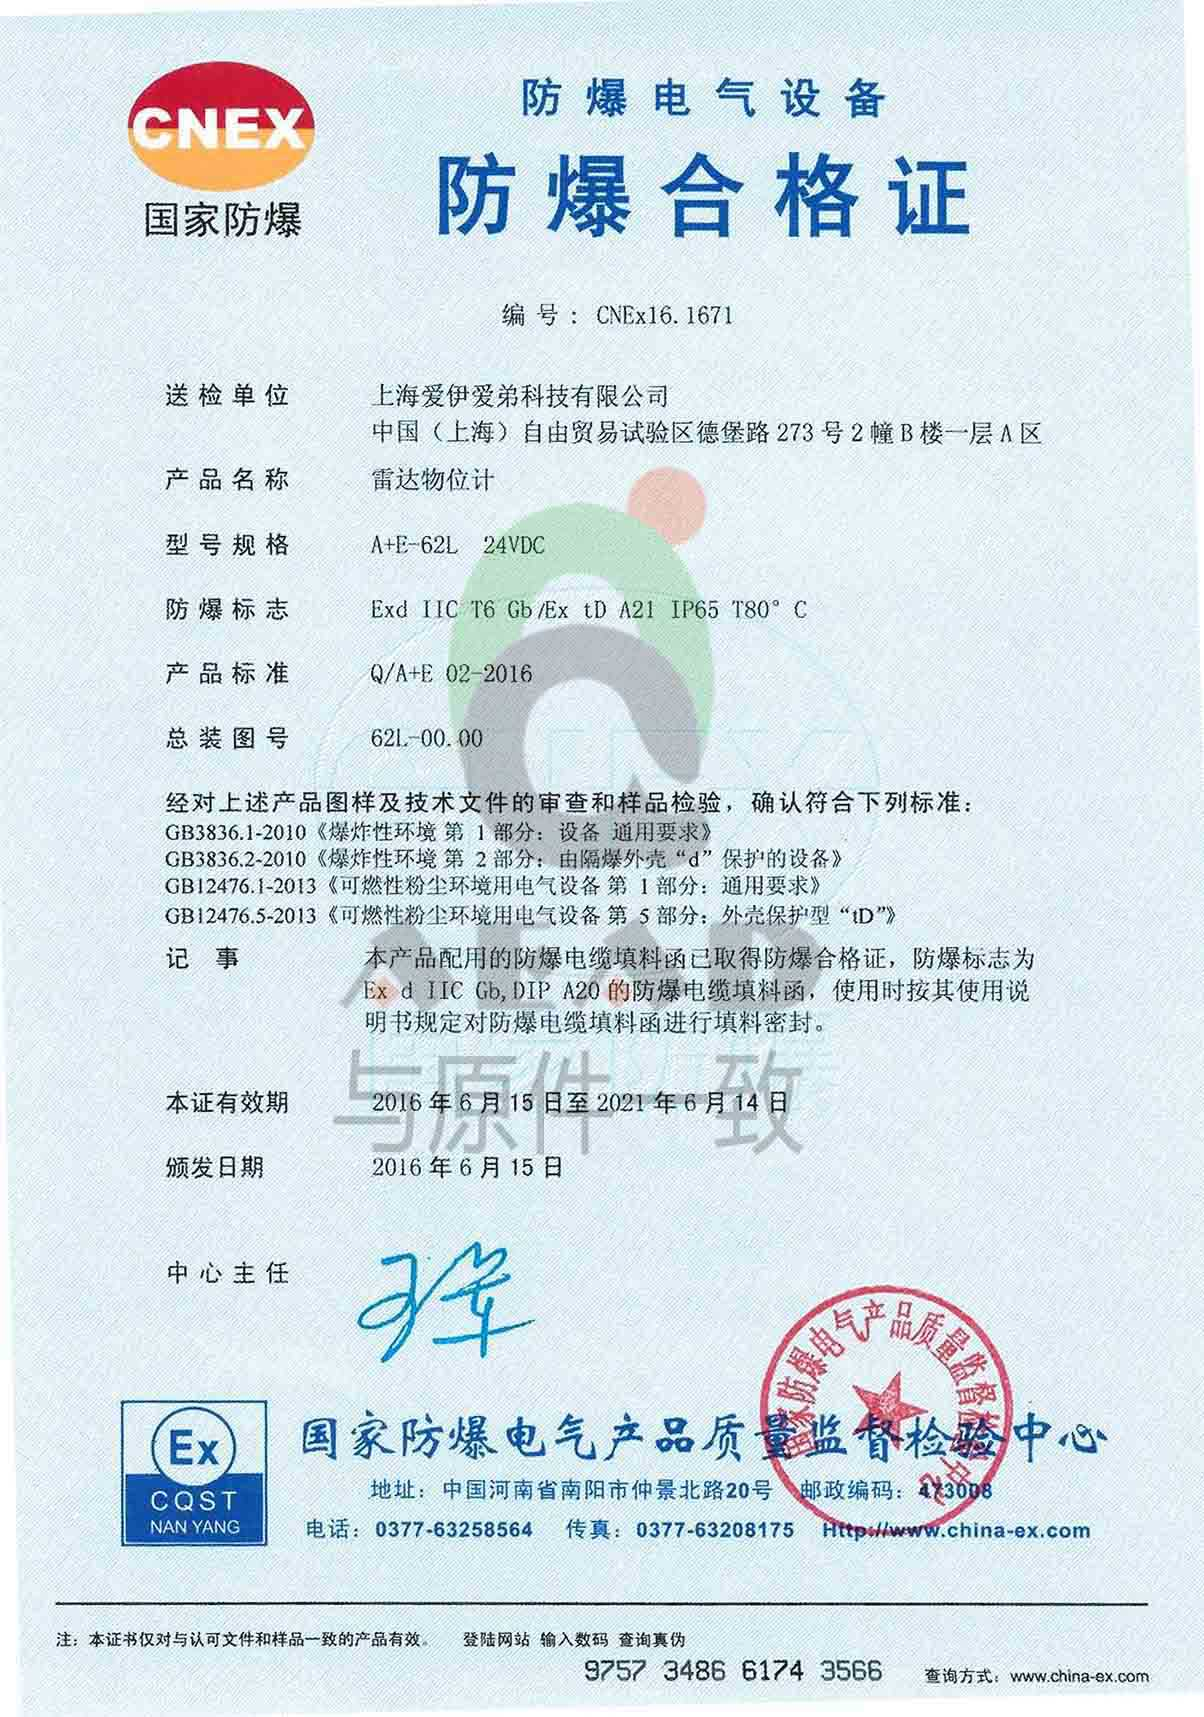 Explosion proof certificate